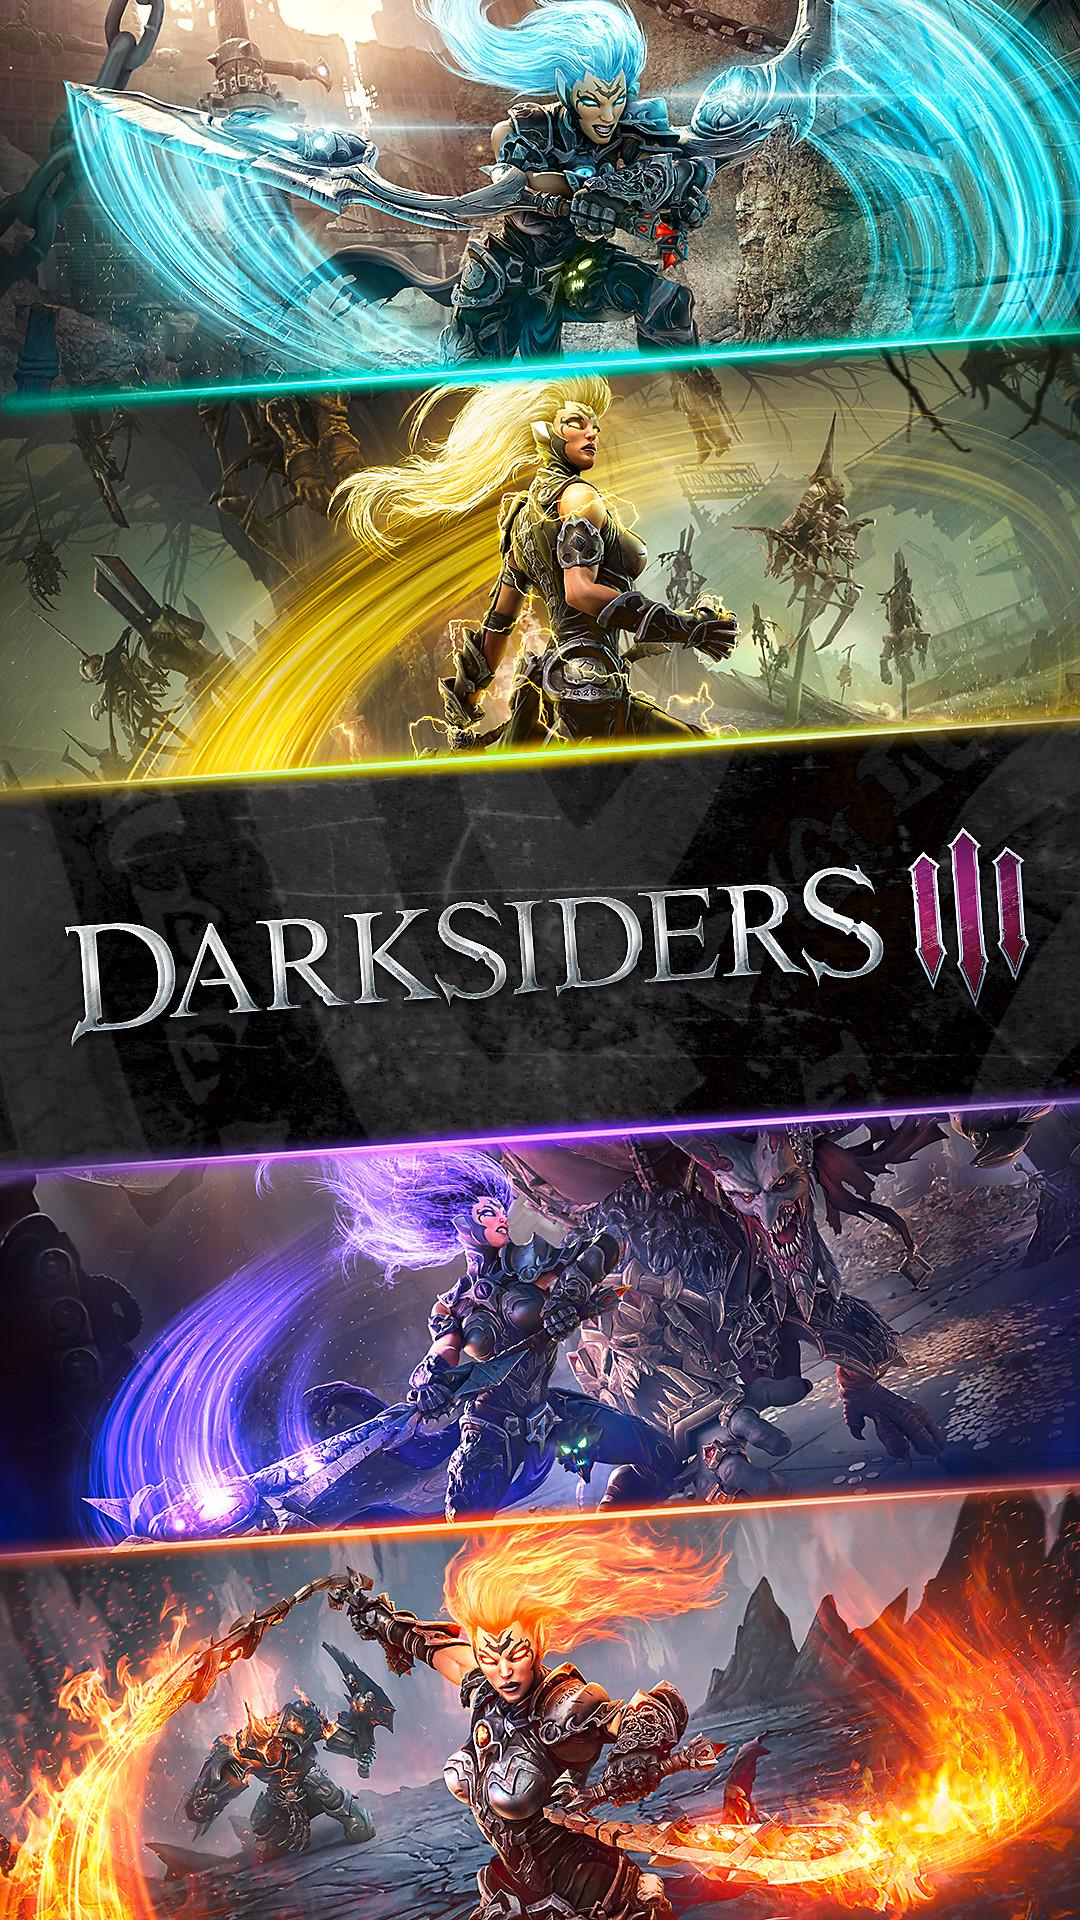 Playstation wallpapers playstation - Darksiders 3 wallpaper ...